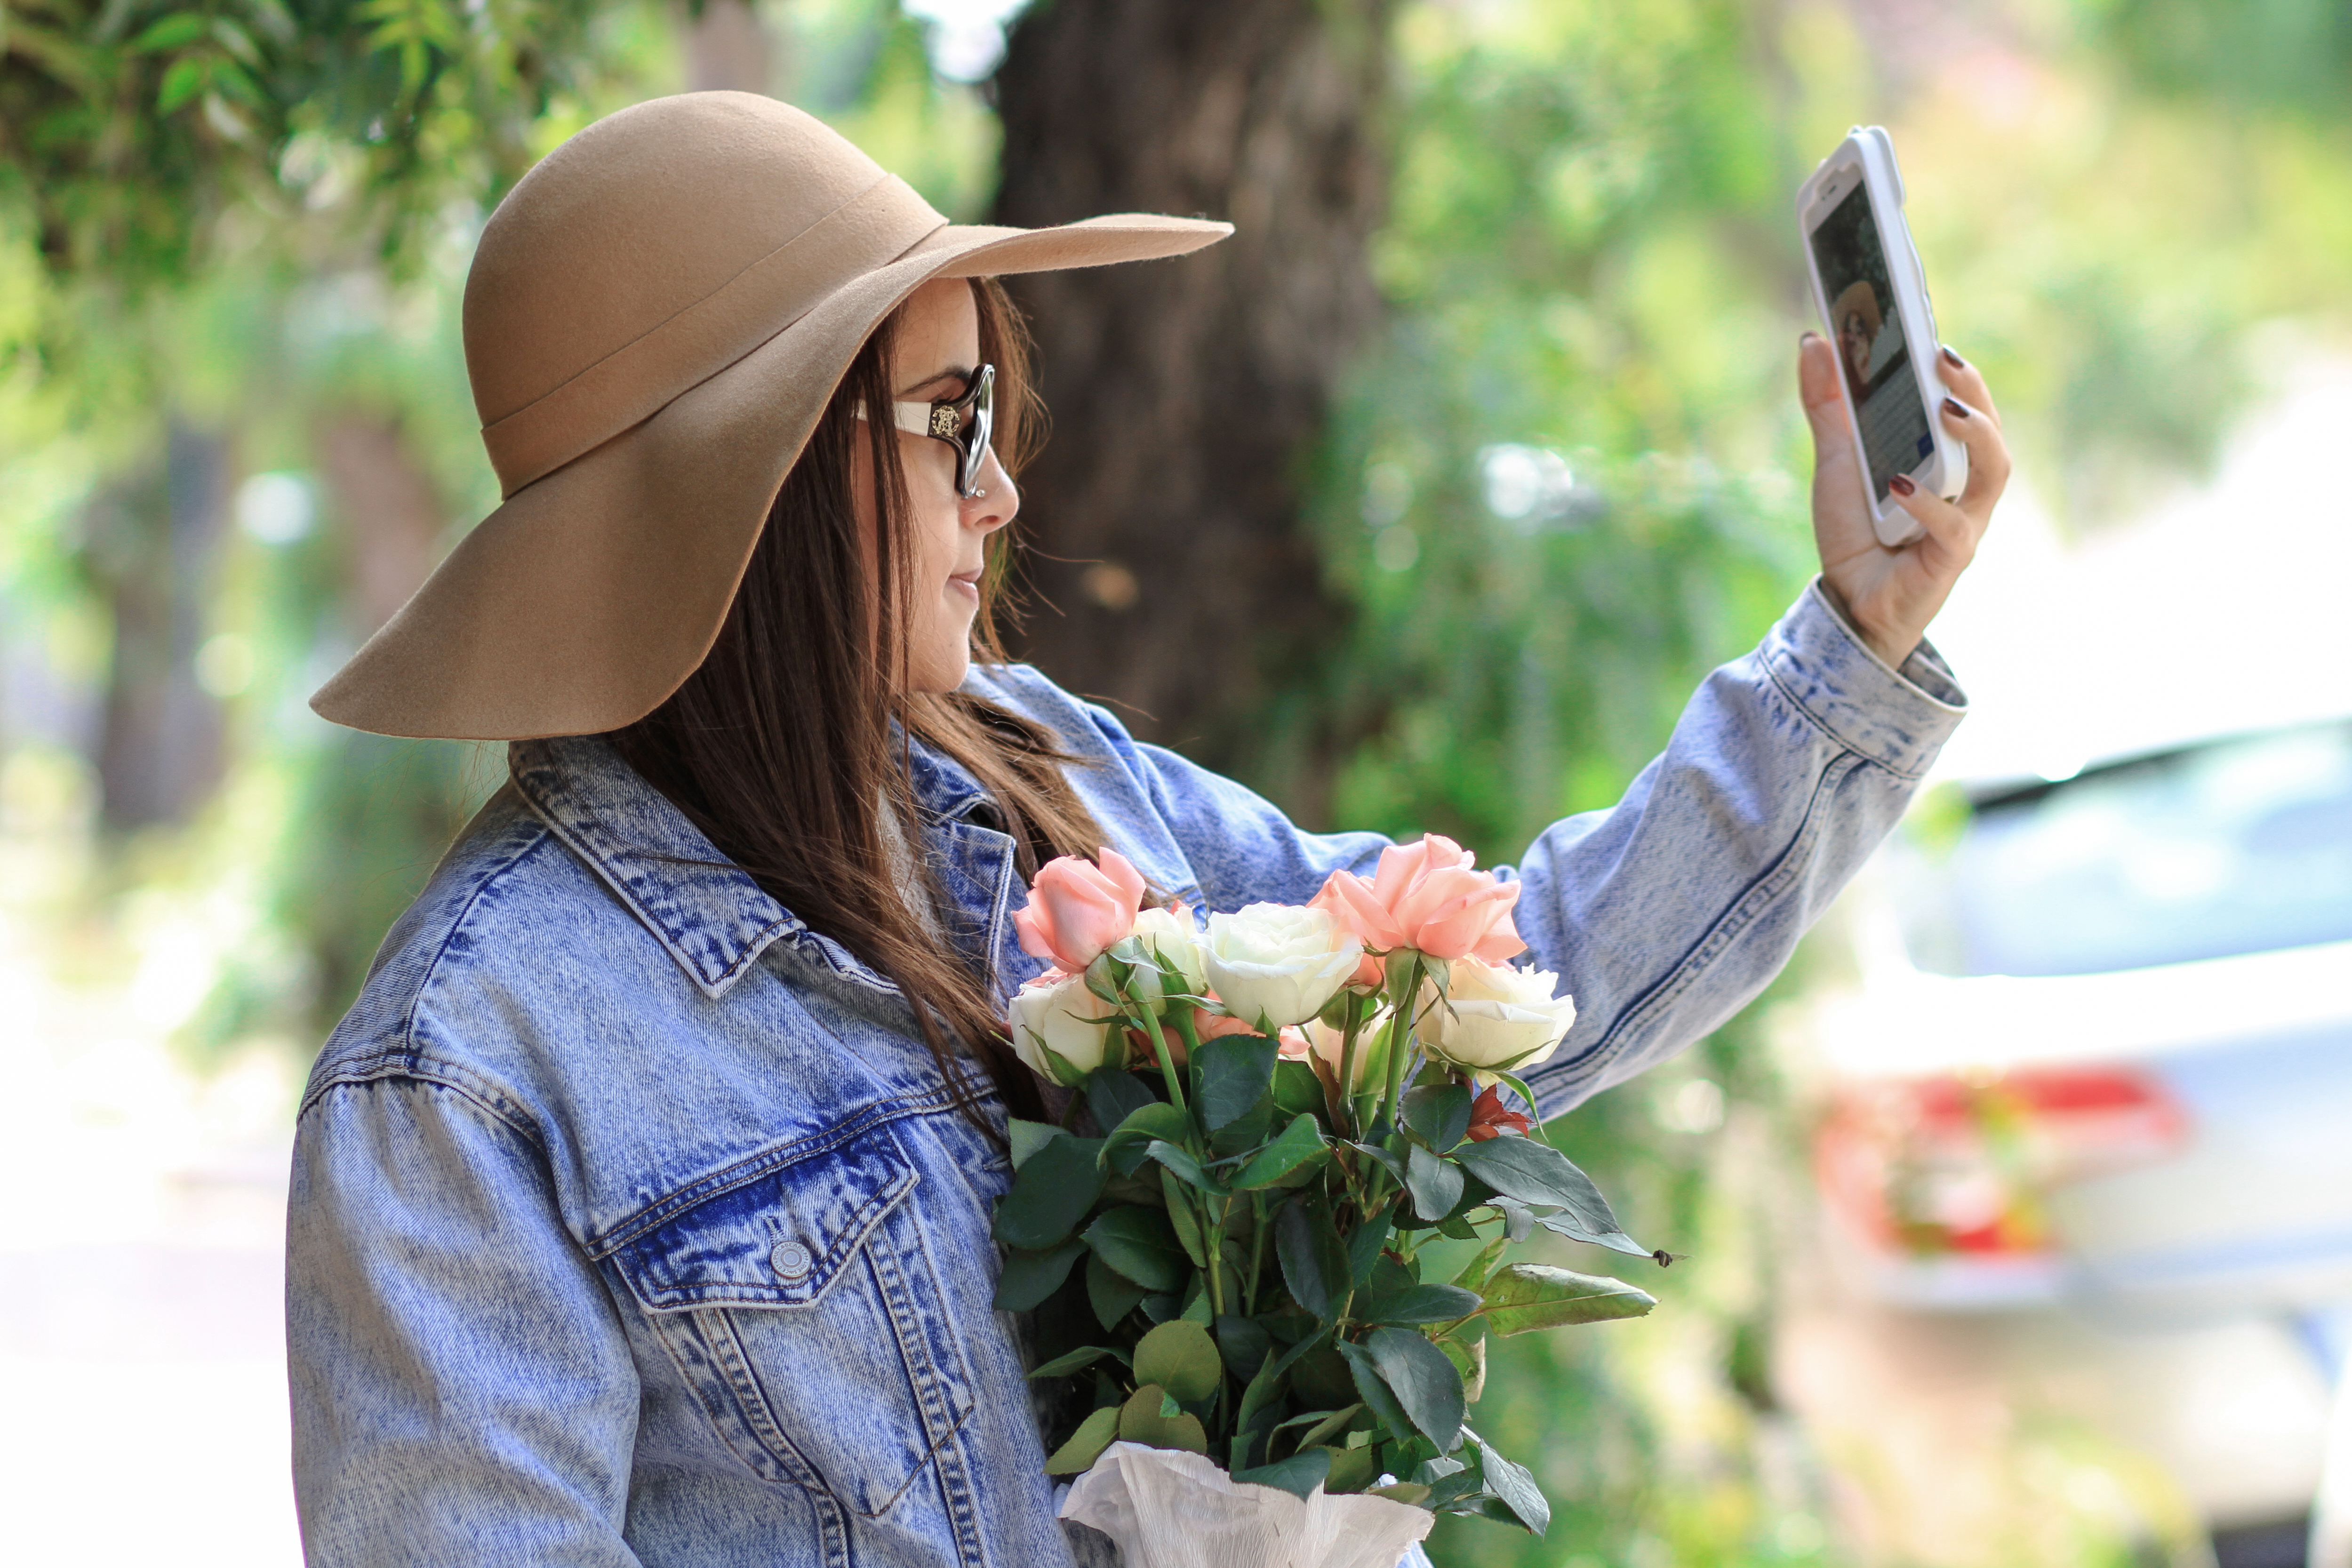 Lace-&-Flowers-mode-blog-chiccarpediem-mode-9